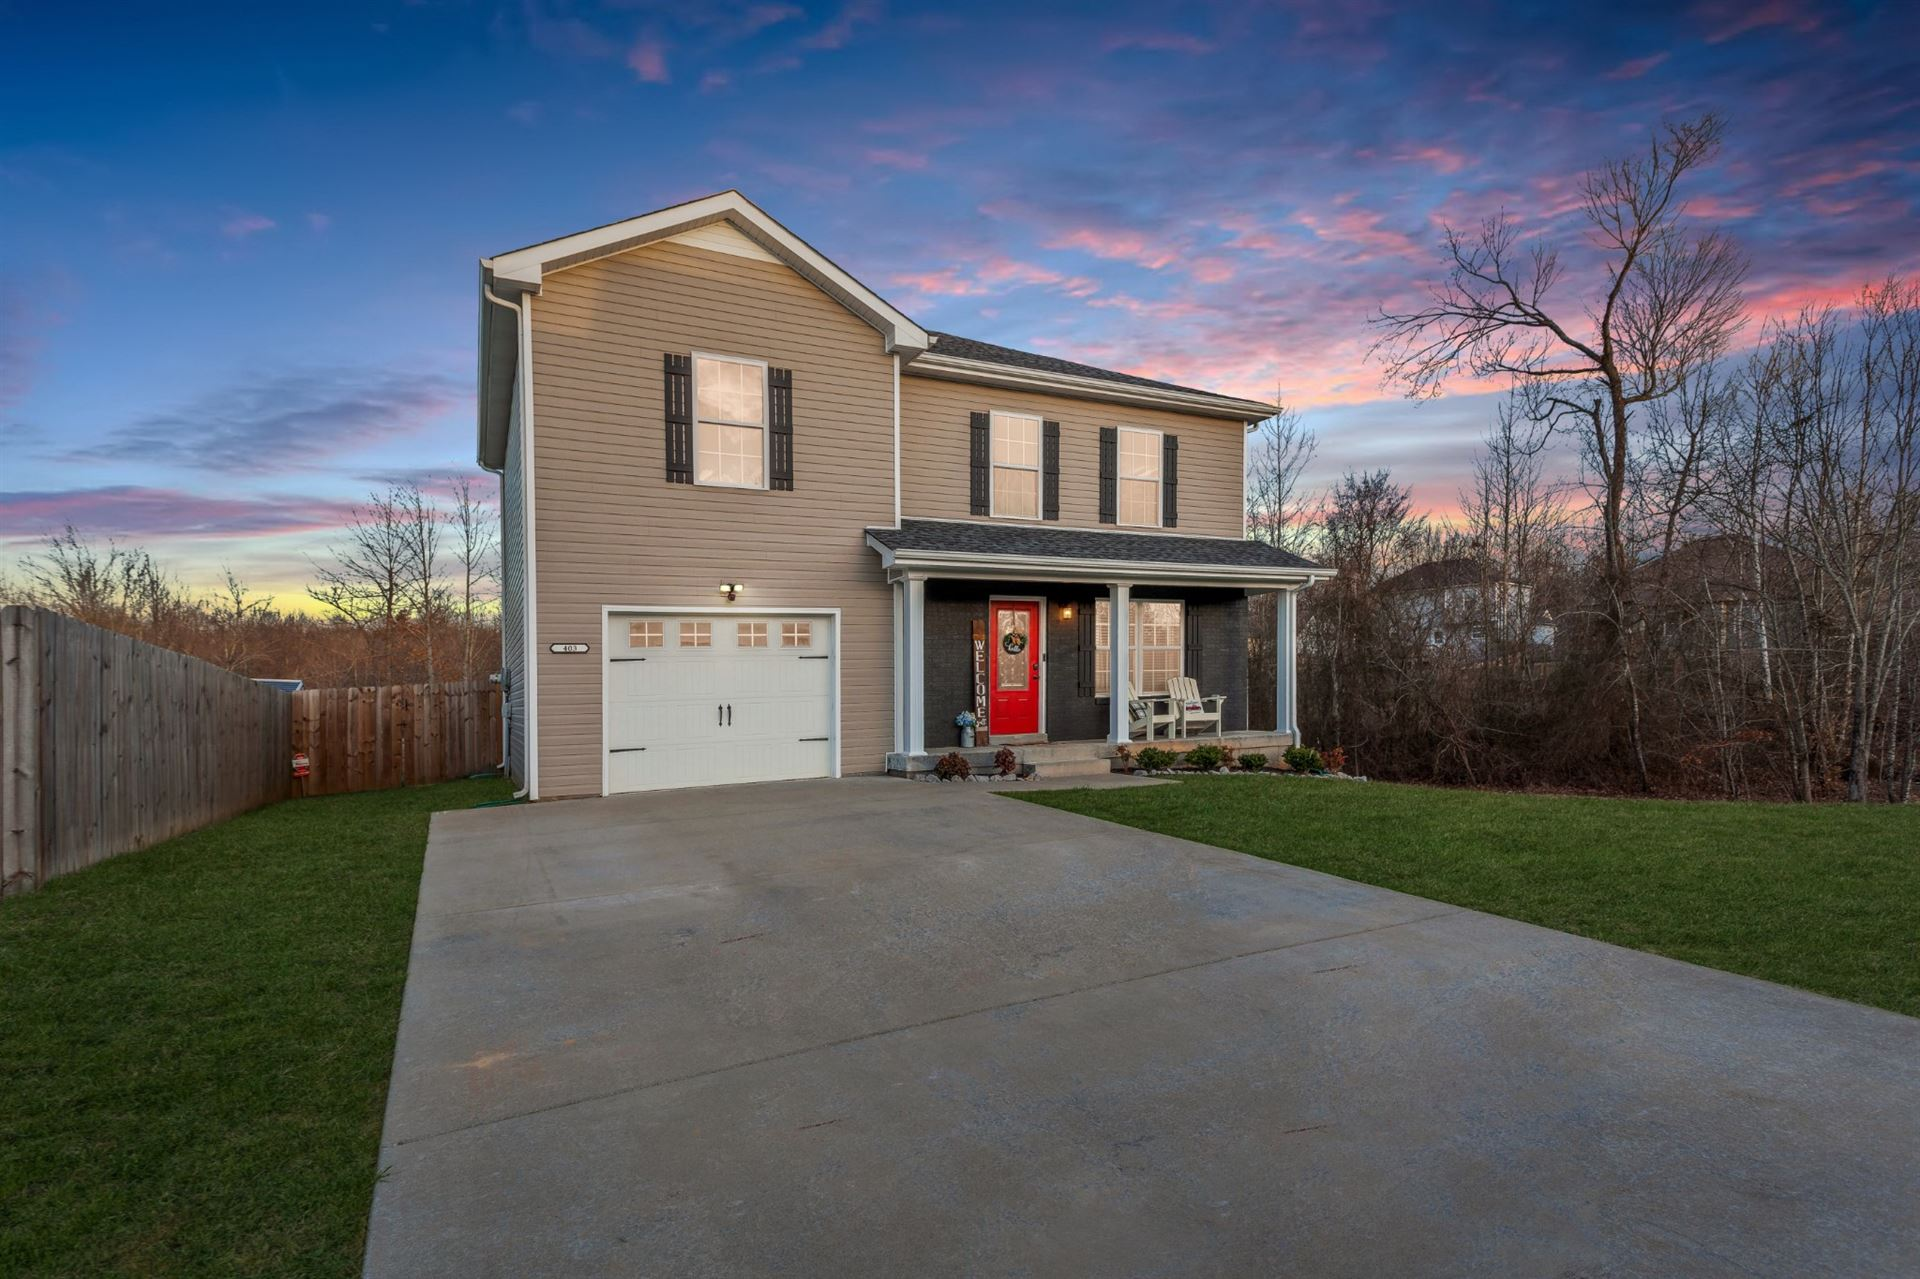 Photo of 403 Sapling St, Clarksville, TN 37042 (MLS # 2233824)